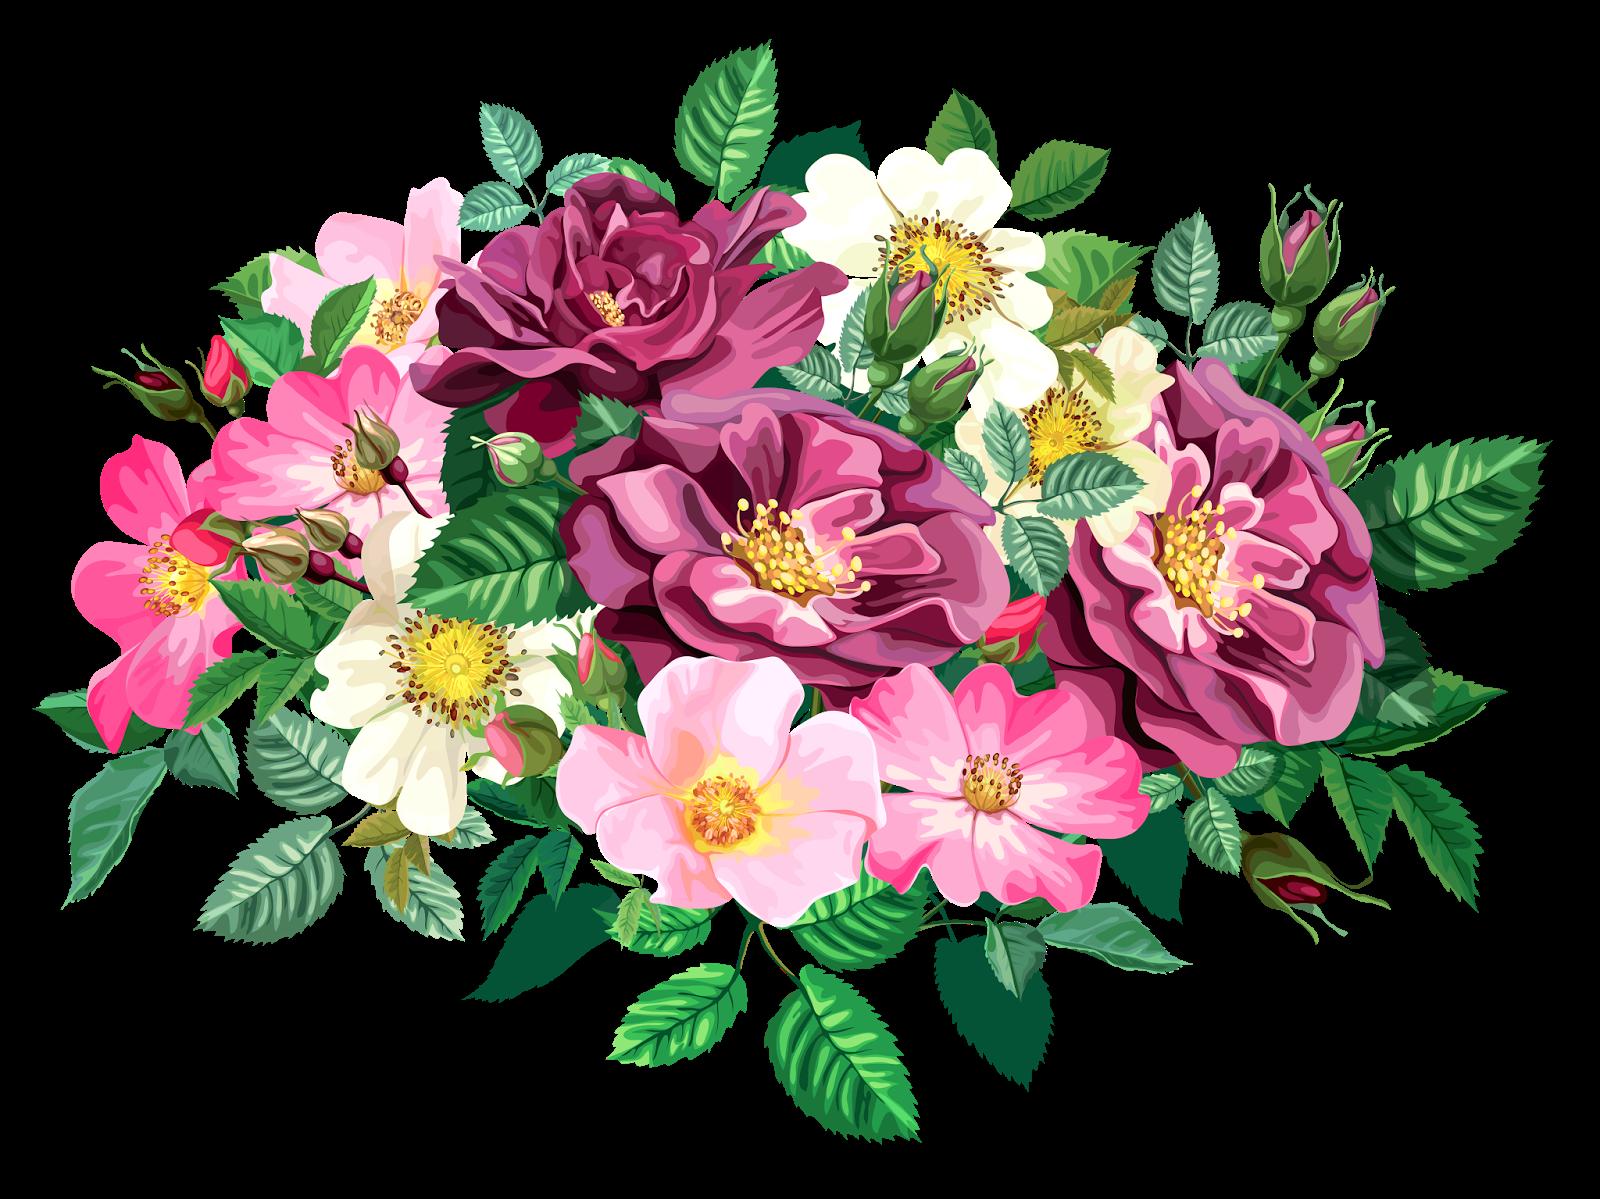 Flower bunches clipart jpg free ROSE BOUQUET CLİPART TRANSPARENT | Design Patterns Studio | Flower ... jpg free